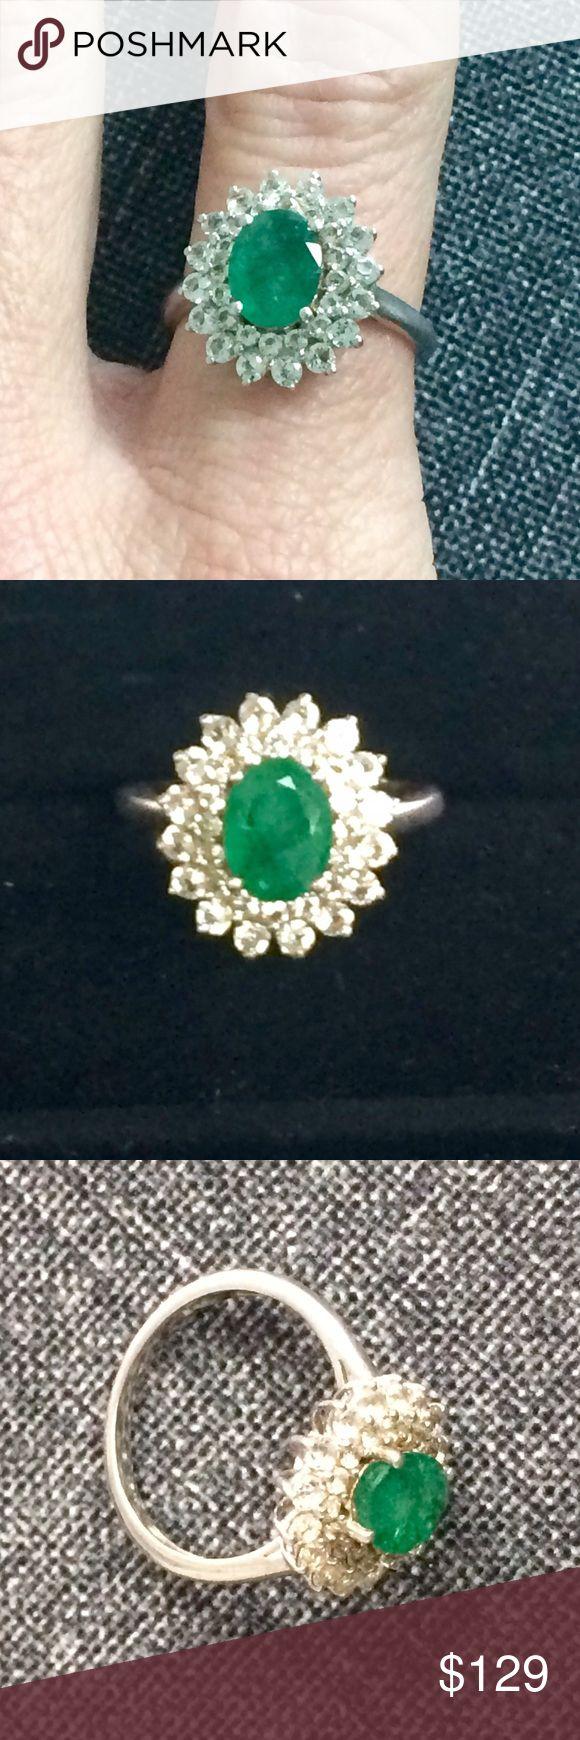 Zambian Emerald white Topaz Sterling Silver ring Gorgeous genuine Zambian Emerald and White Topaz ring set in sterling silver. Size 6 Jewelry Rings